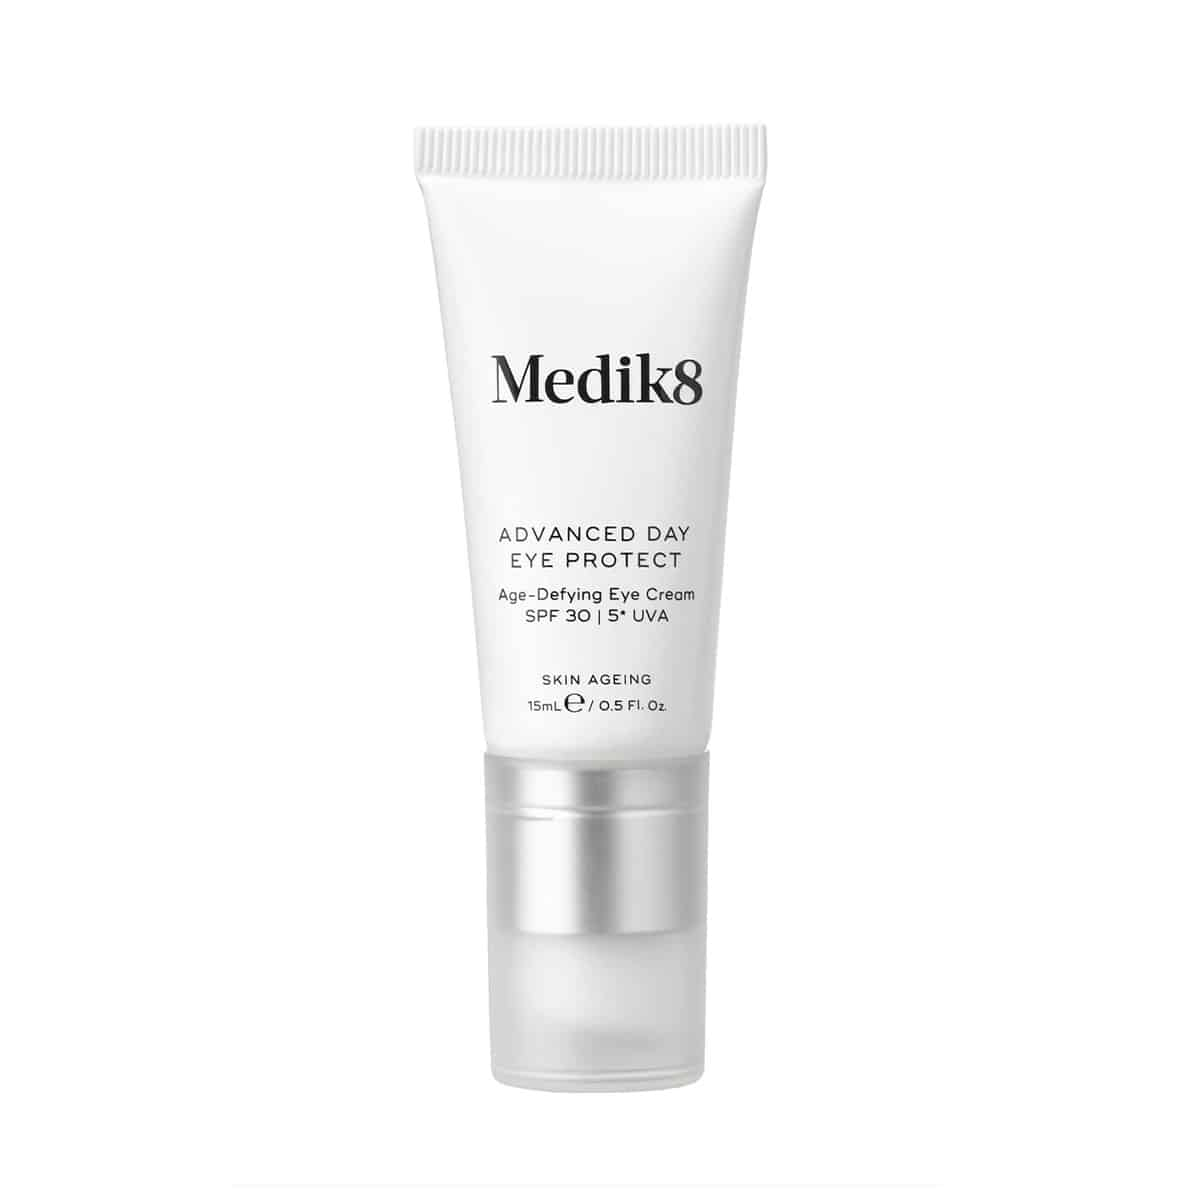 Medik8 Advanced Day Eye Protect